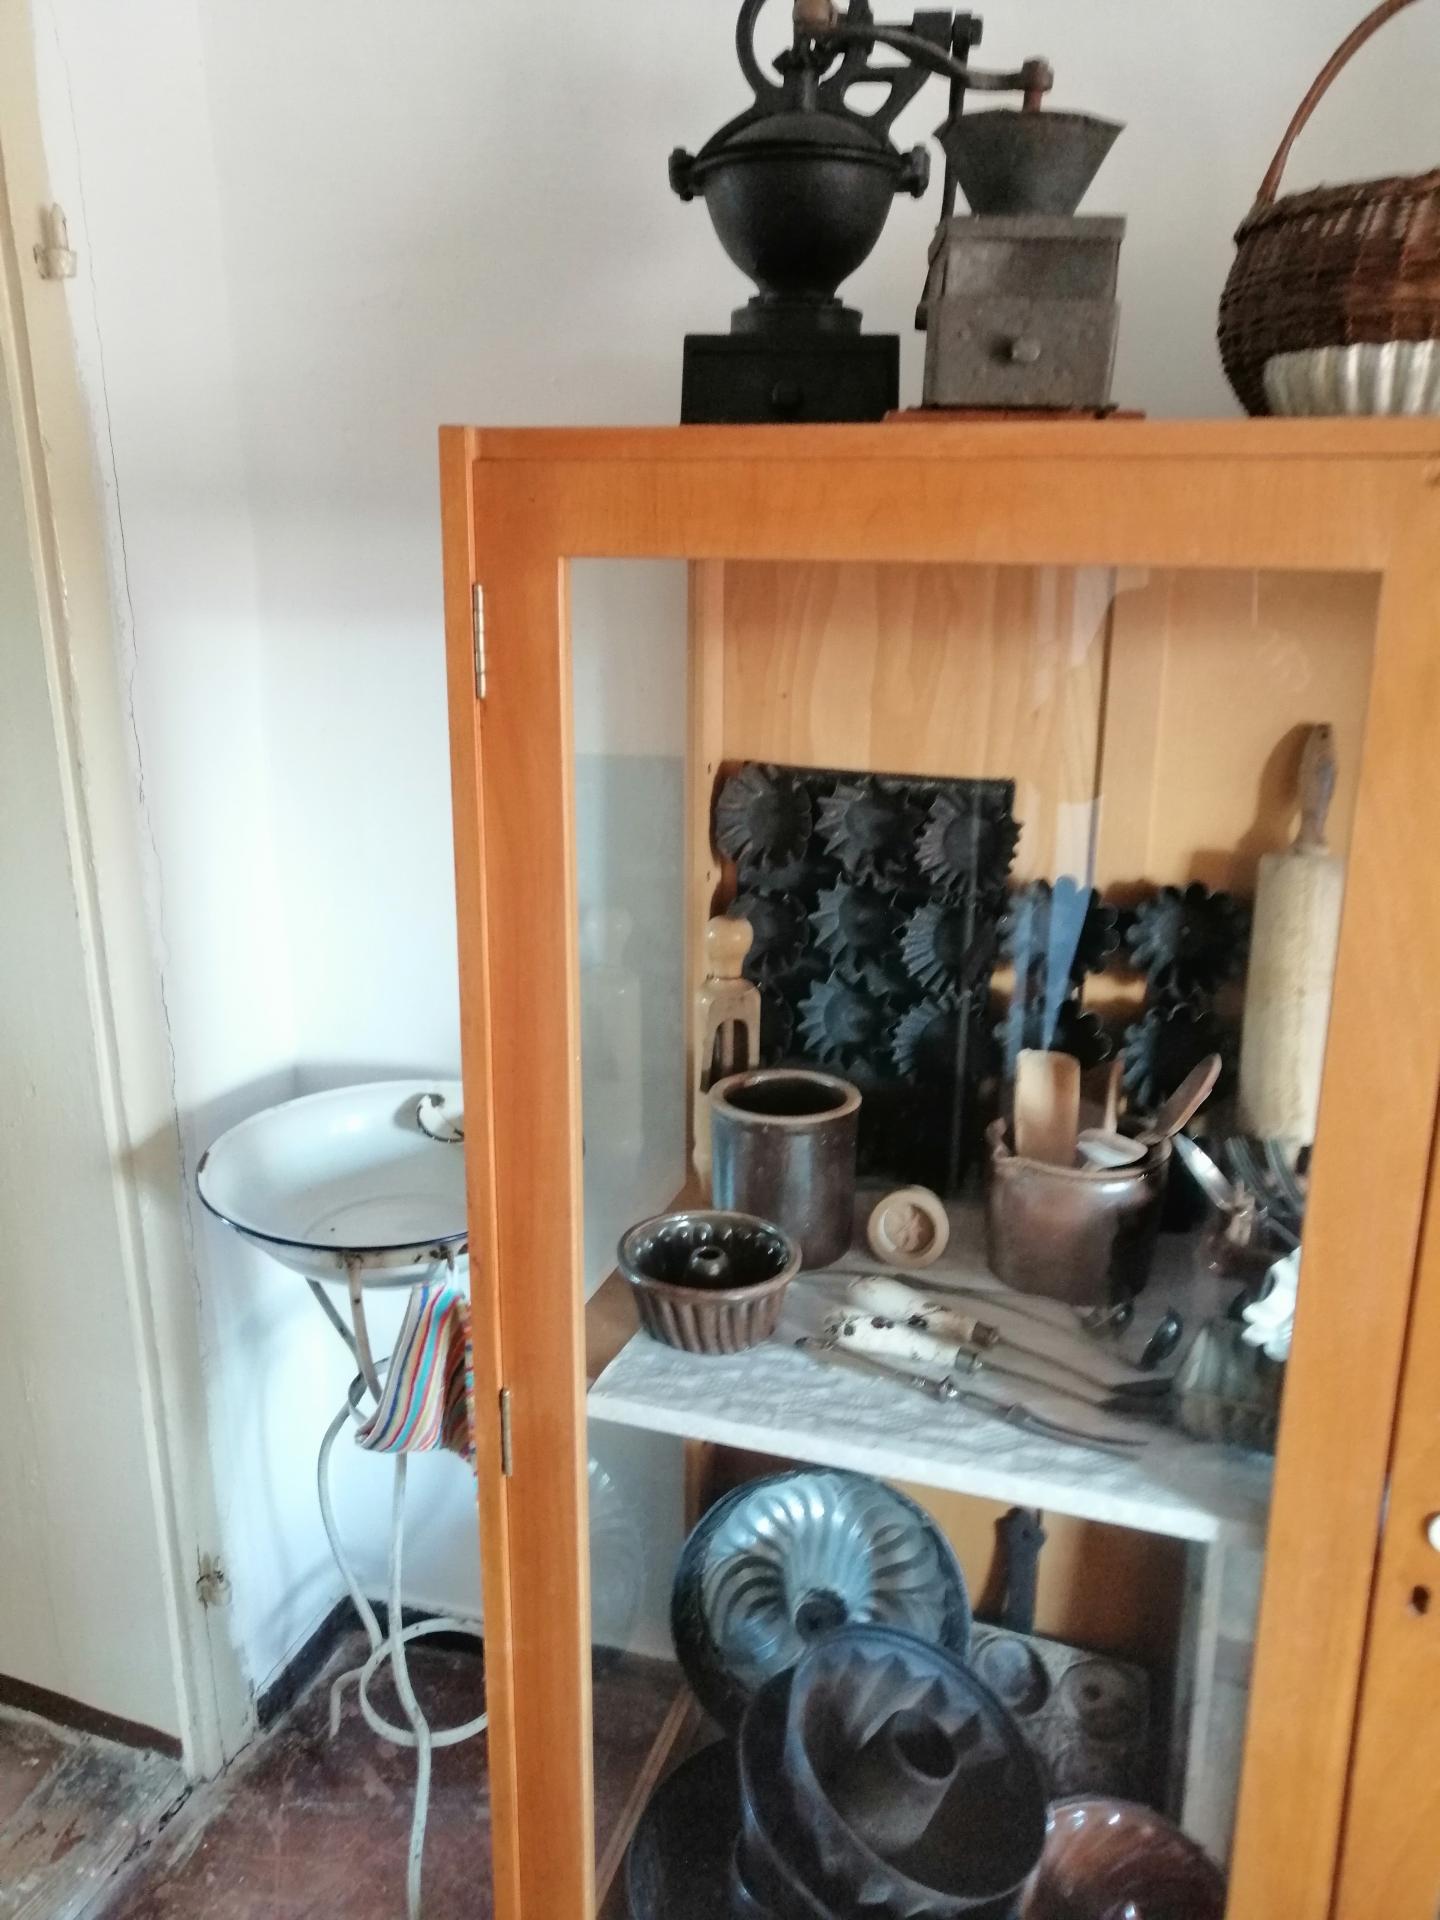 Küchenutensilien vergangener Zeit